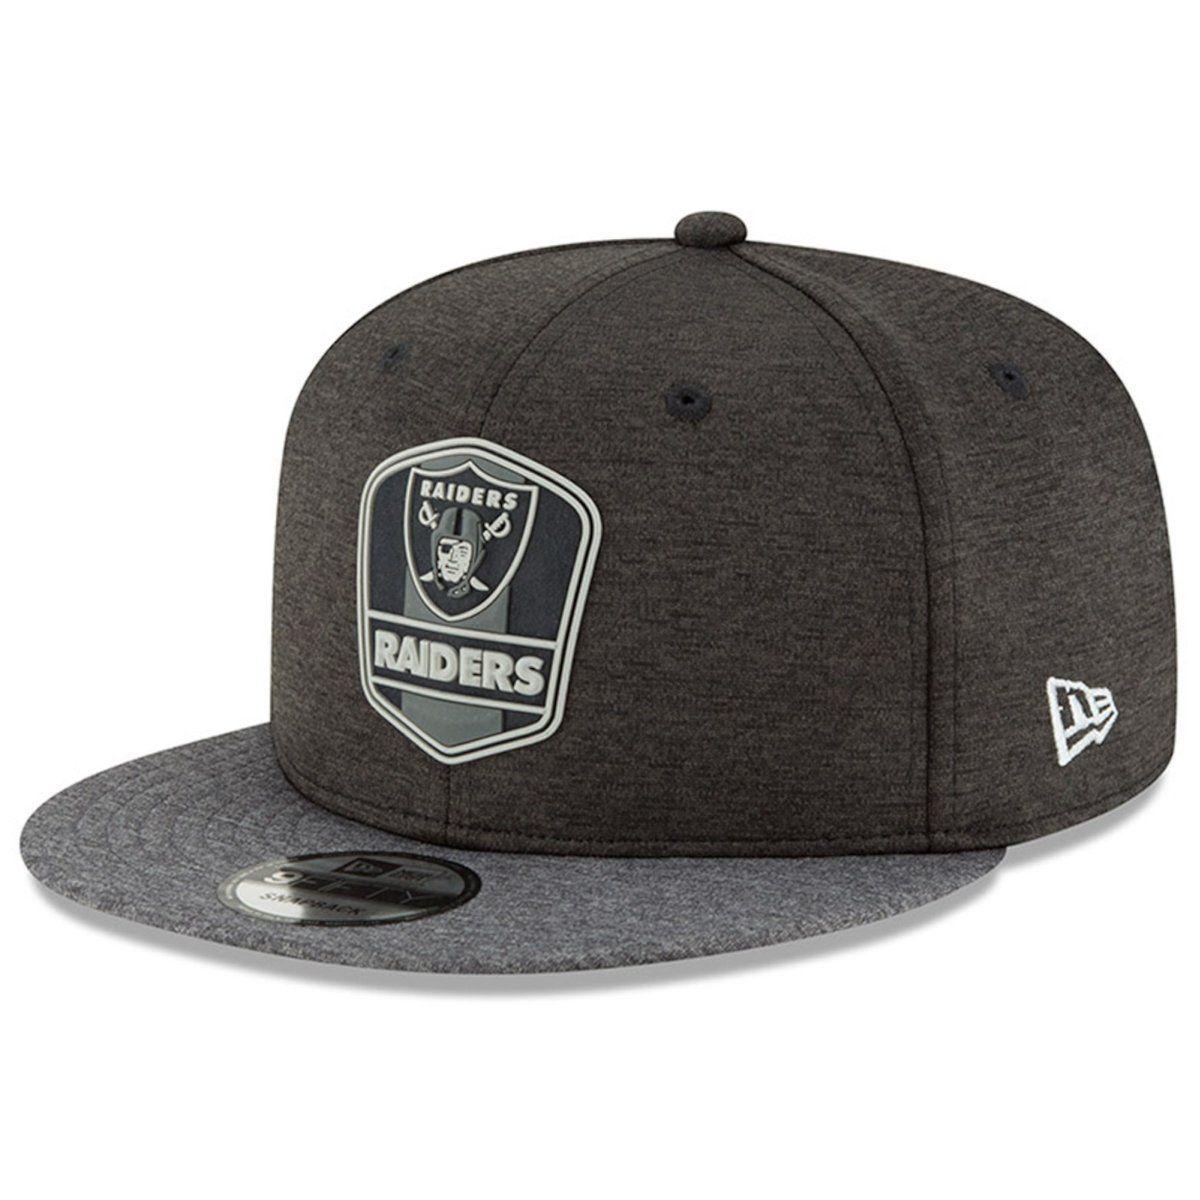 amfoo - New Era Snapback Cap - Black Sideline Oakland Raiders